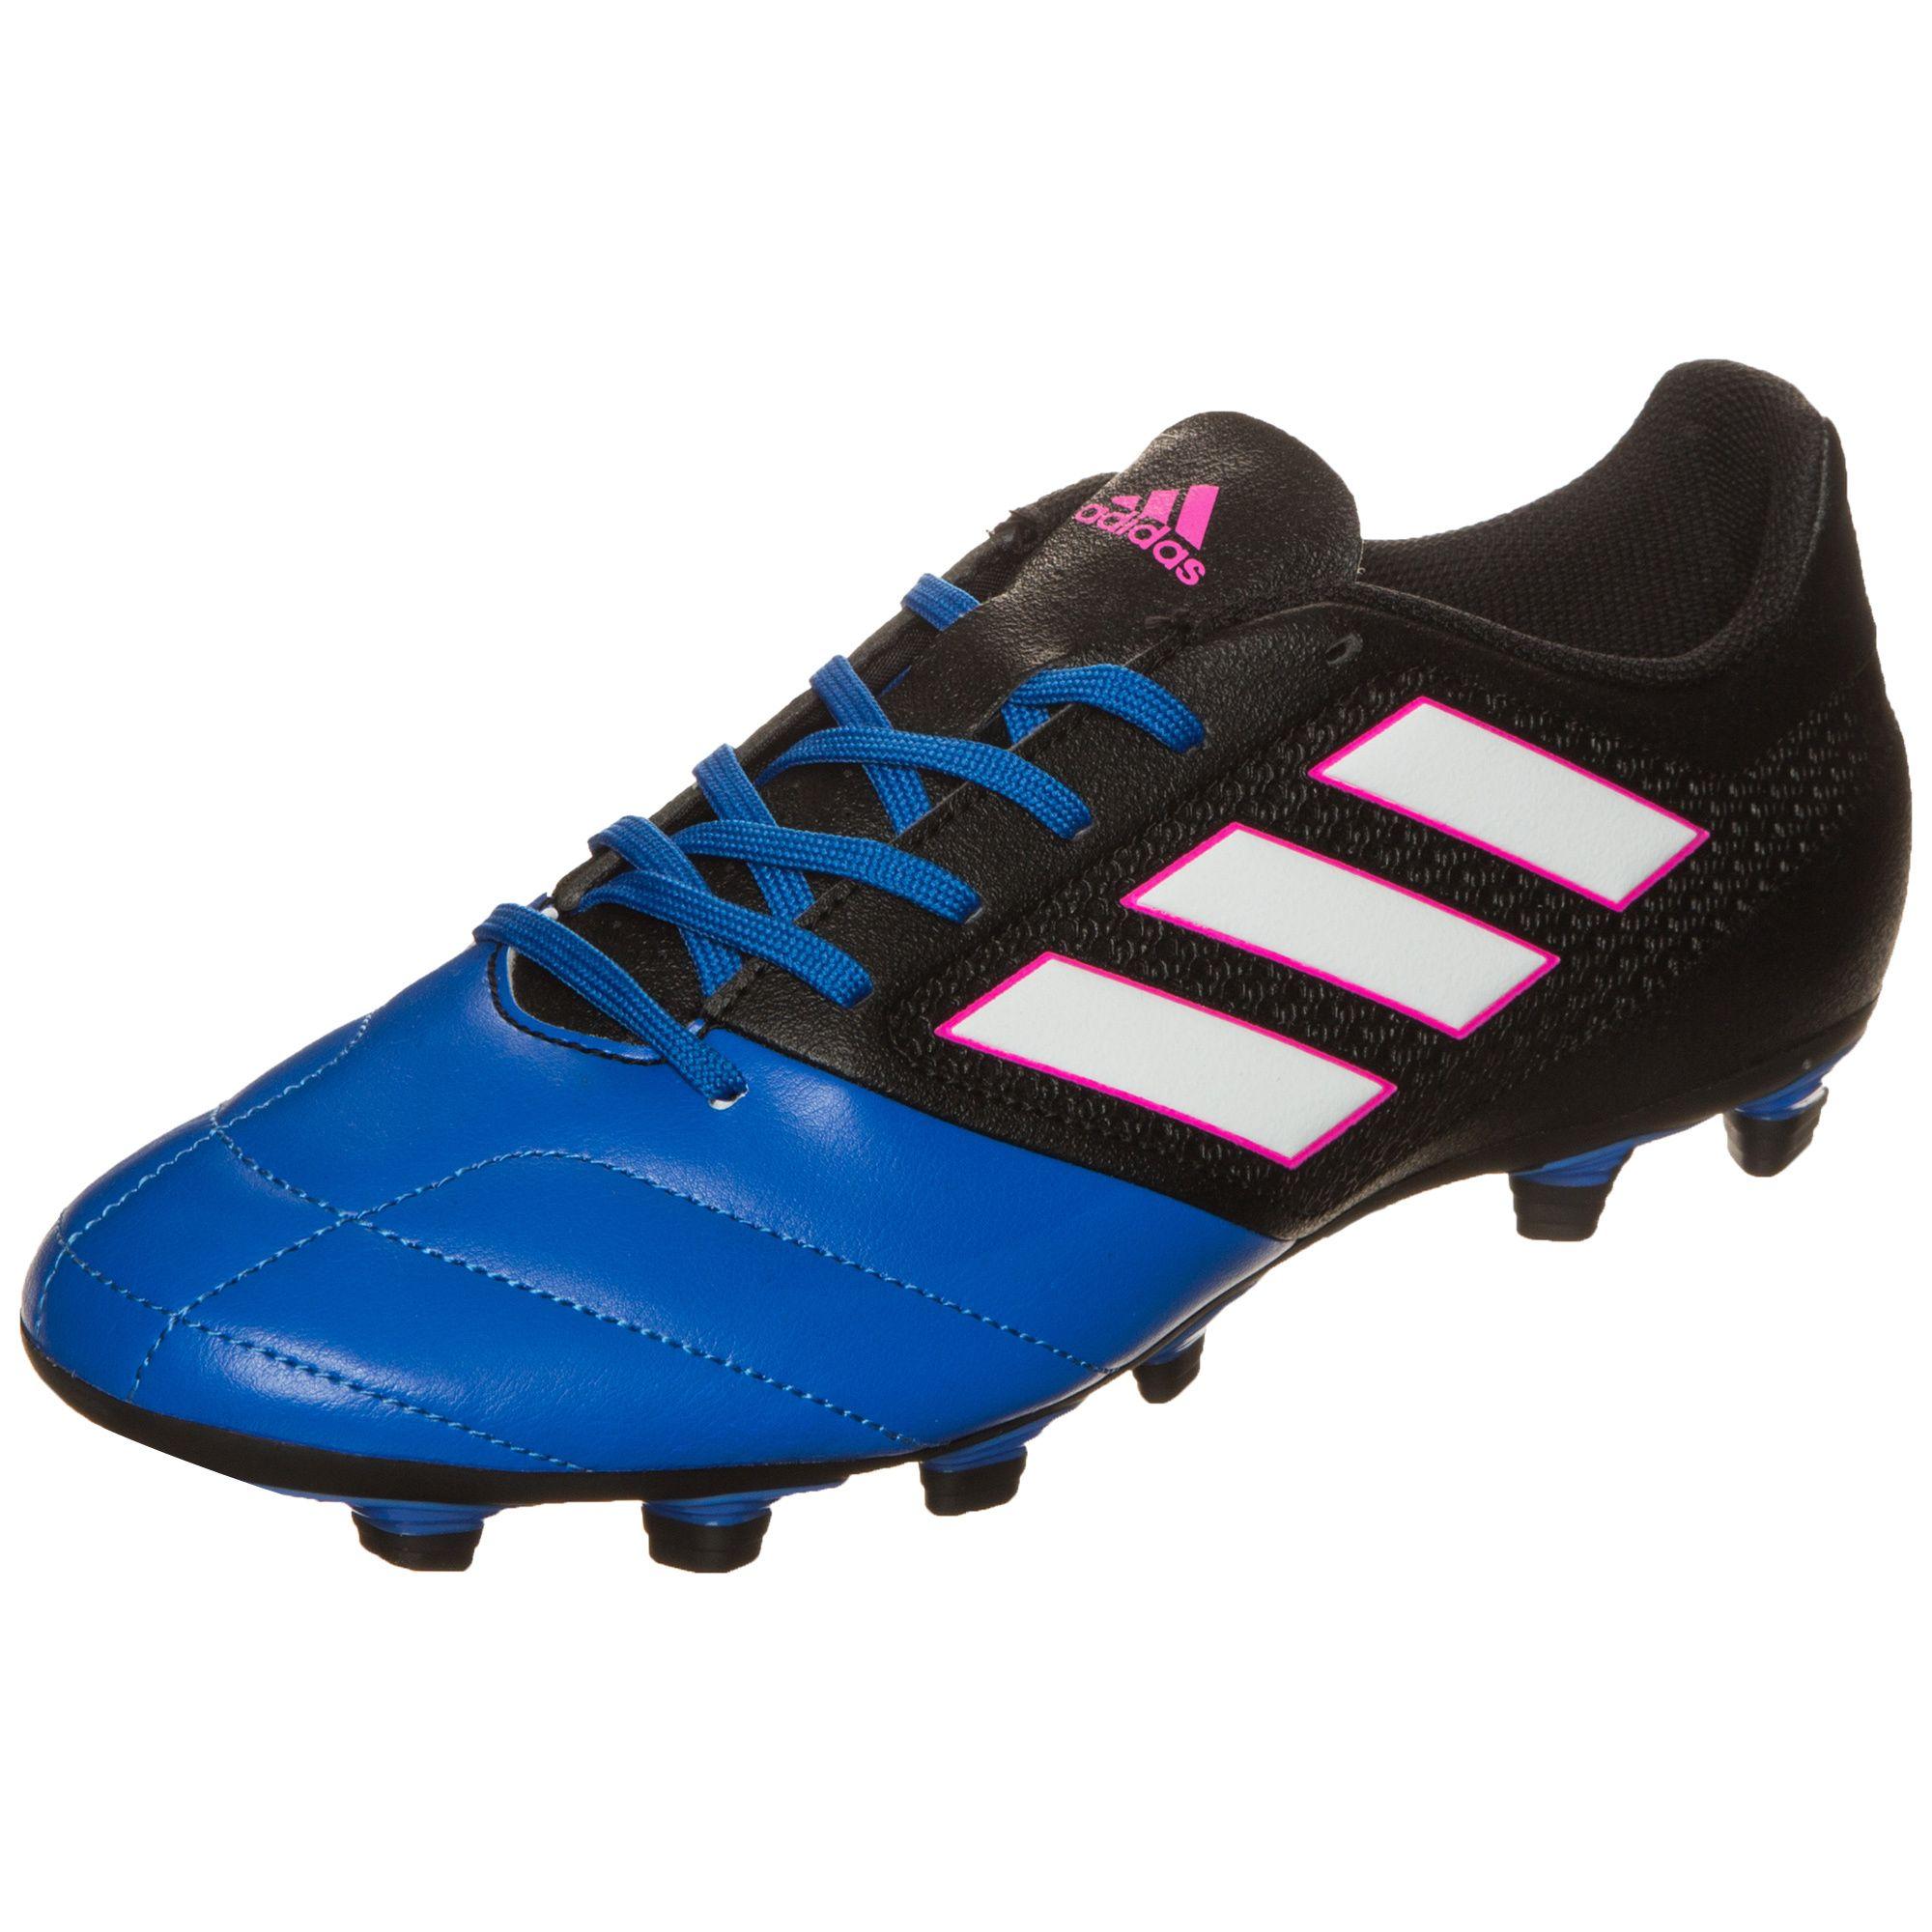 ADIDAS PERFORMANCE adidas Performance ACE 17.4 FxG Fußballschuh Herren